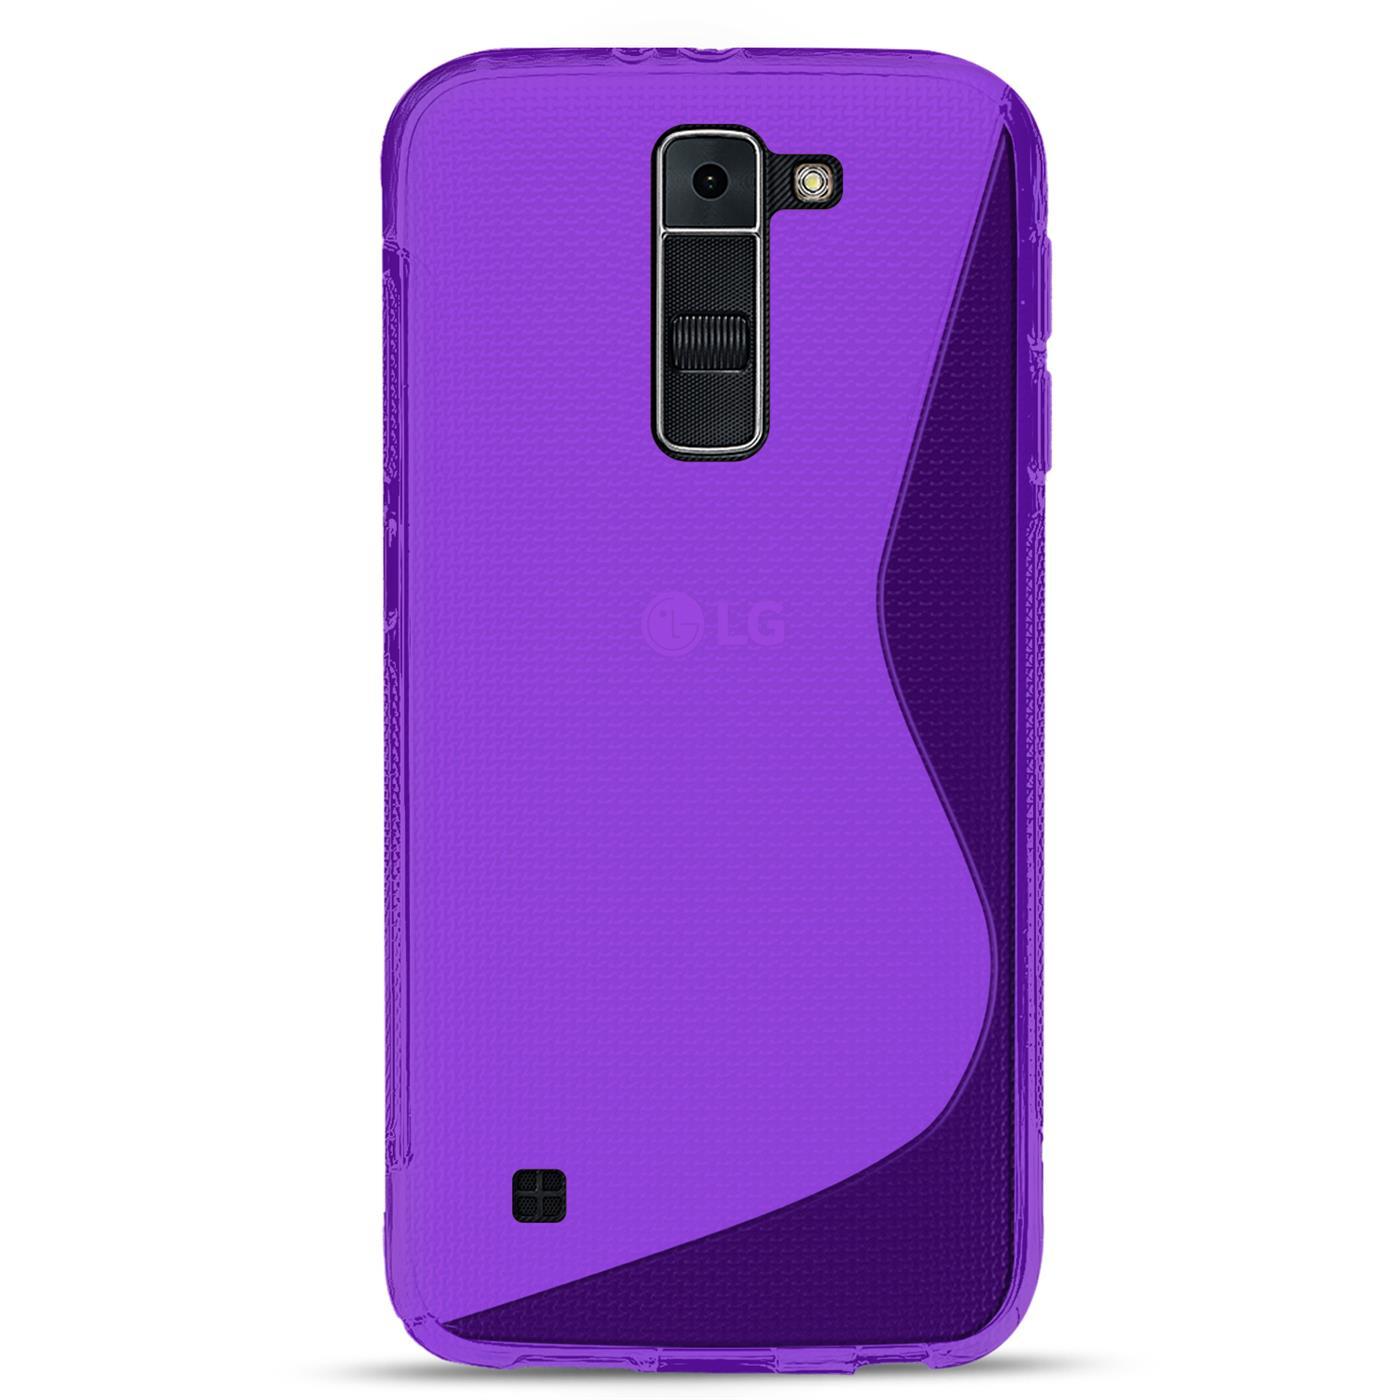 LG-Leon-LTE-Silikon-Gel-S-Line-Case-Cover-Ultra-Thin-Slim-Back-Bumper Indexbild 13